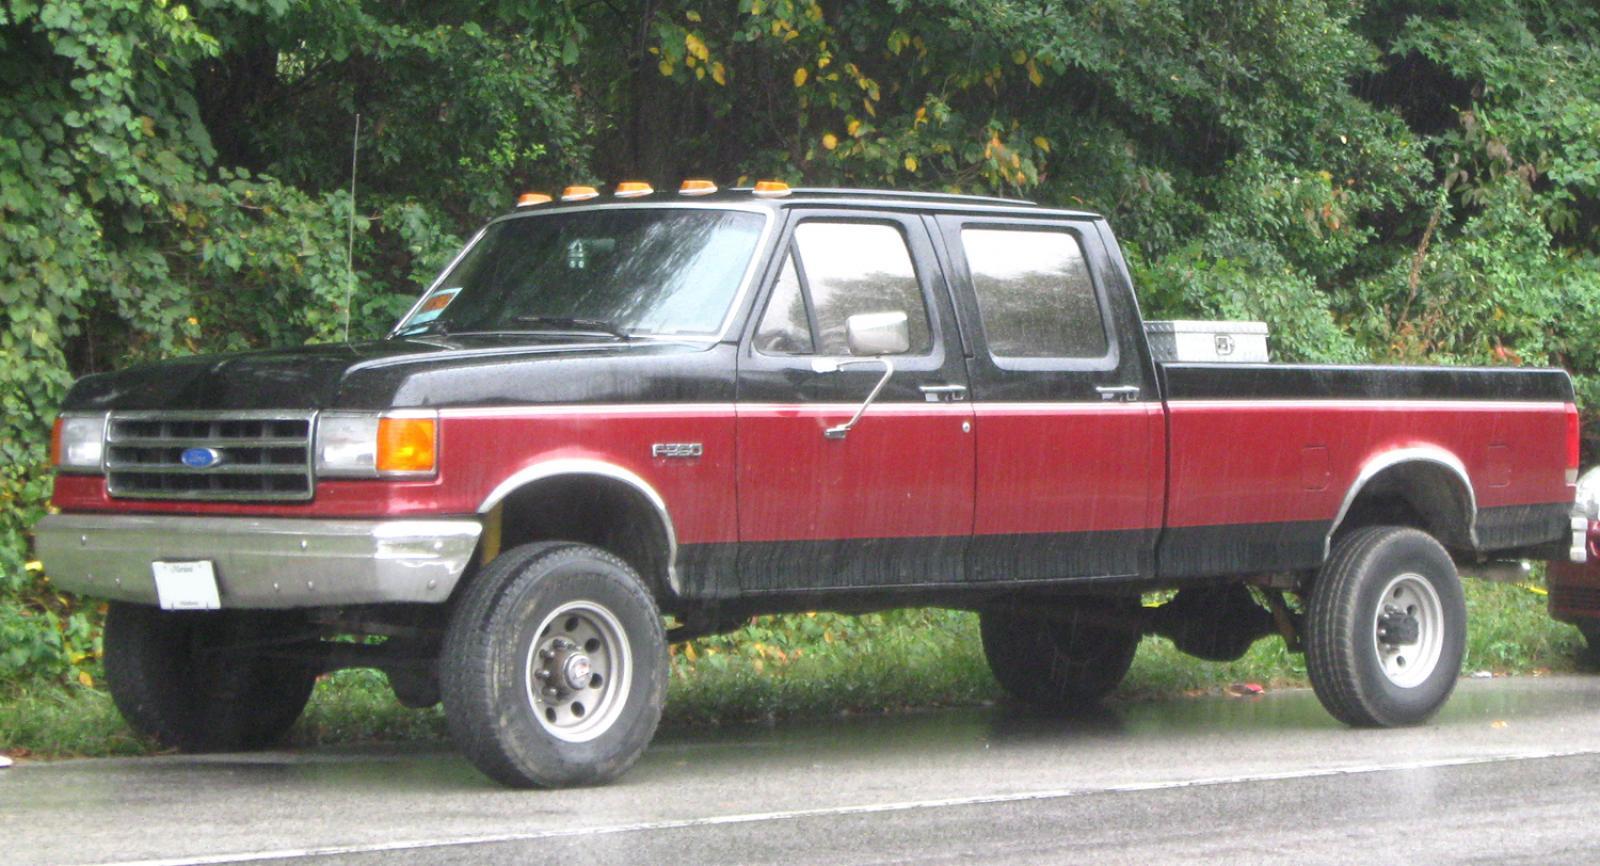 800 1024 1280 1600 origin 1992 ford f 250